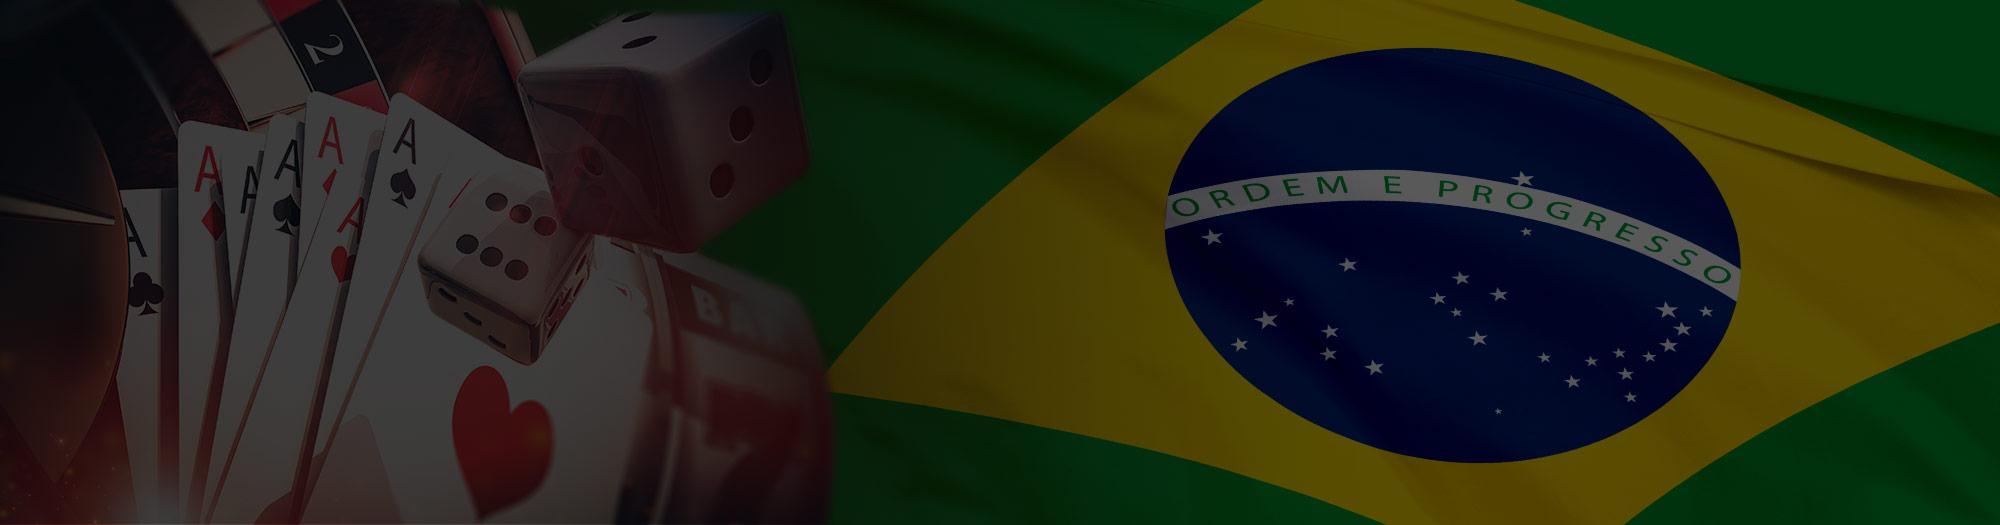 Casino famosos National Brasil 57390